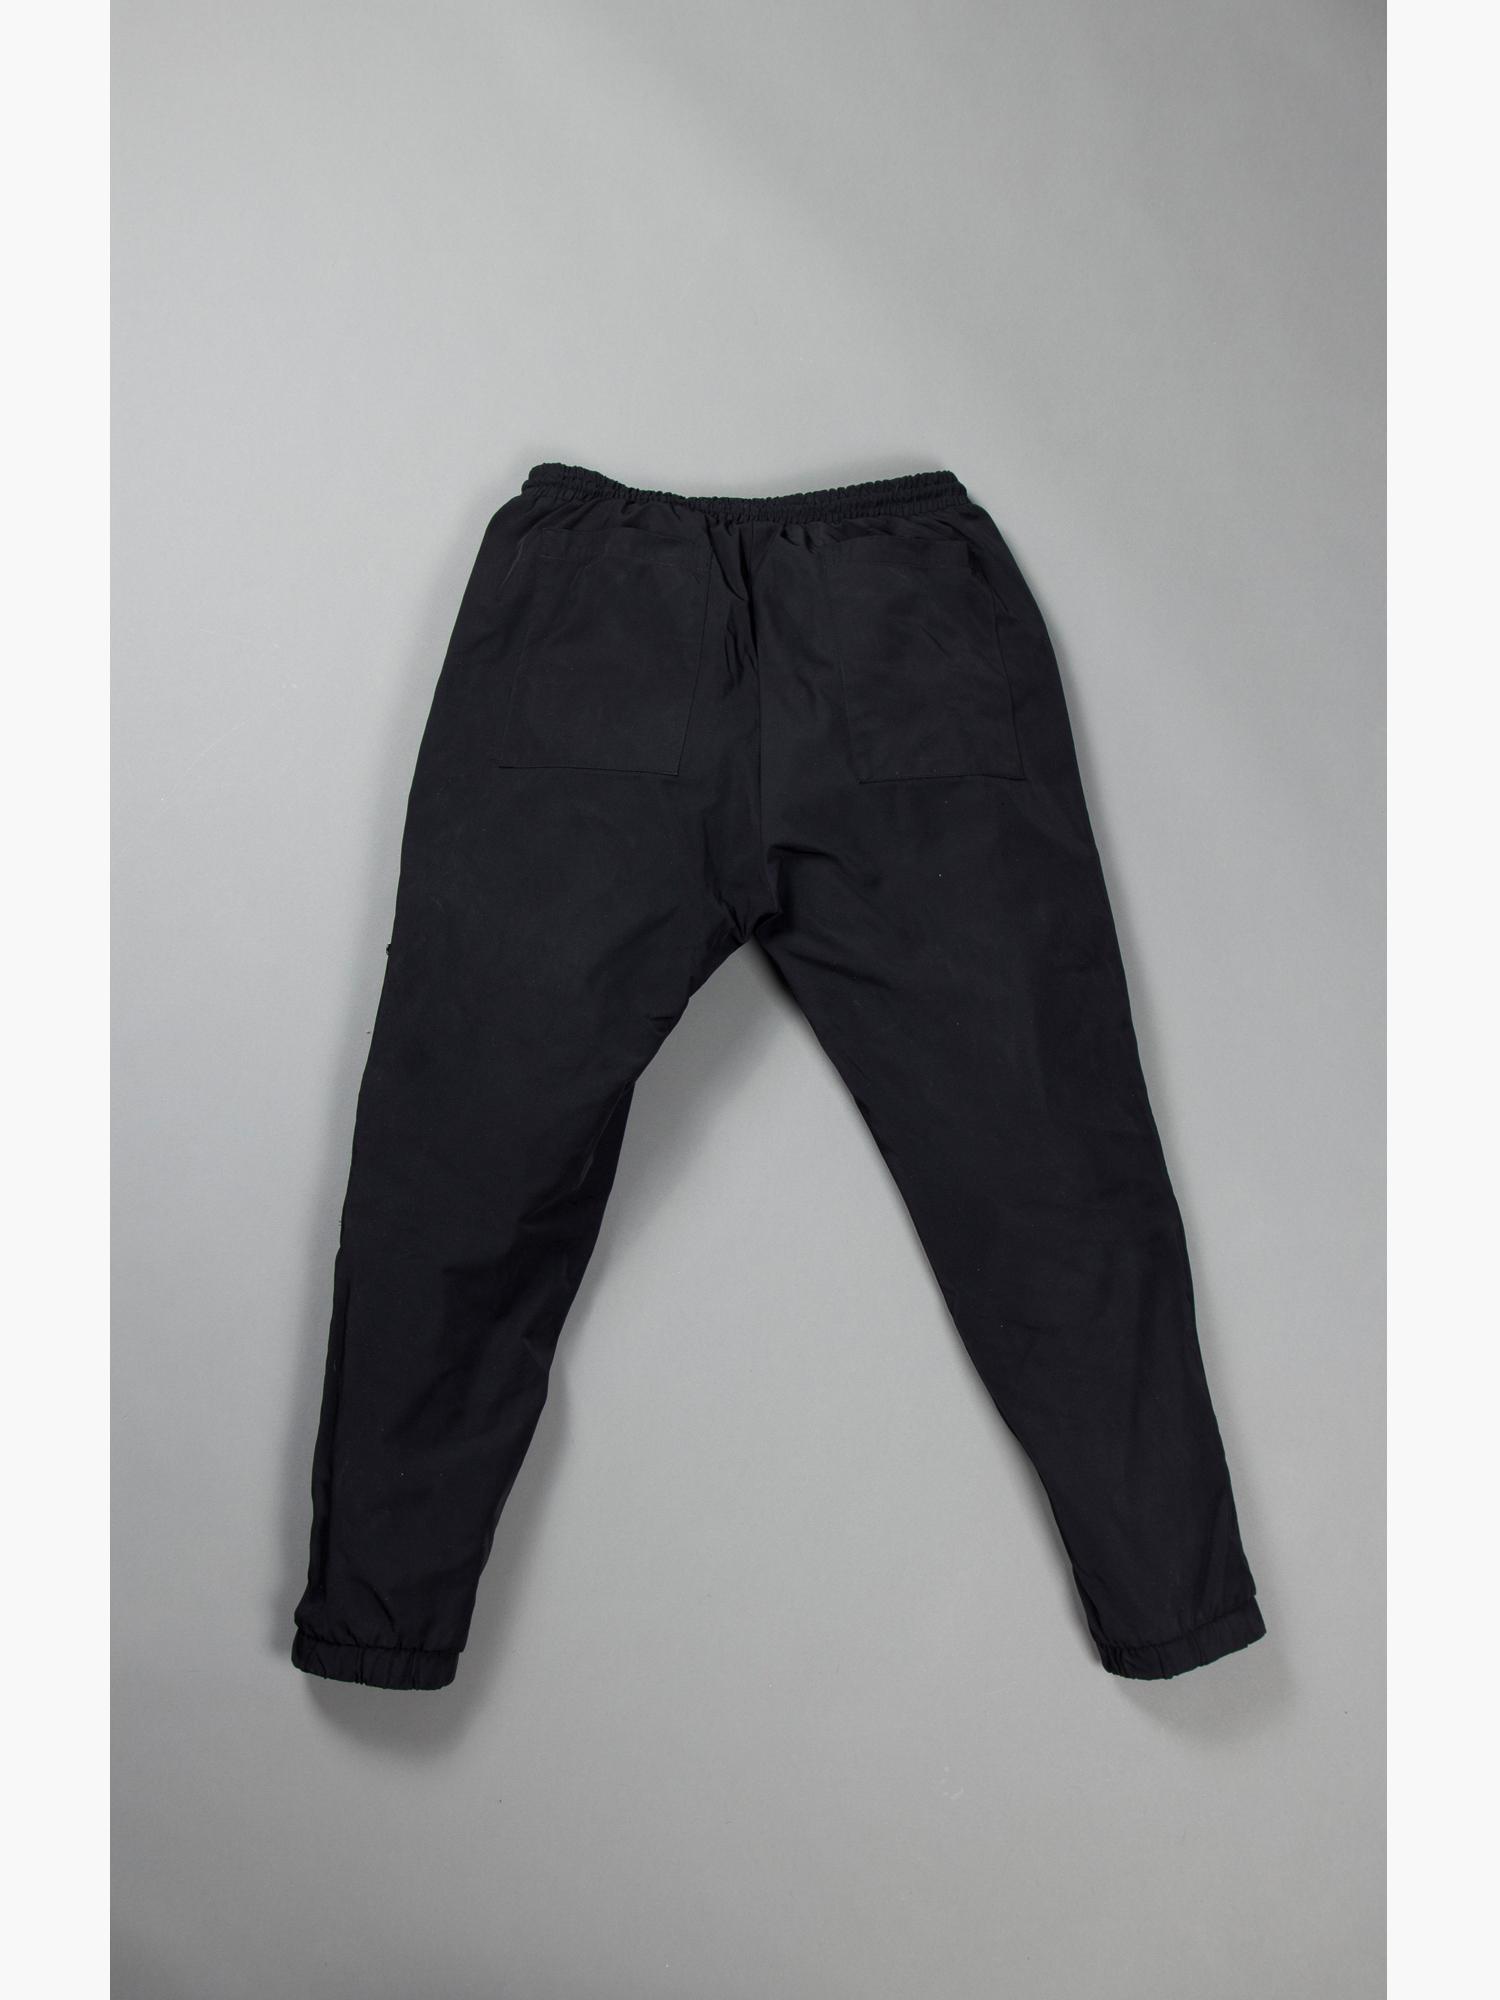 ATHRTY_cupid_pants_black_b